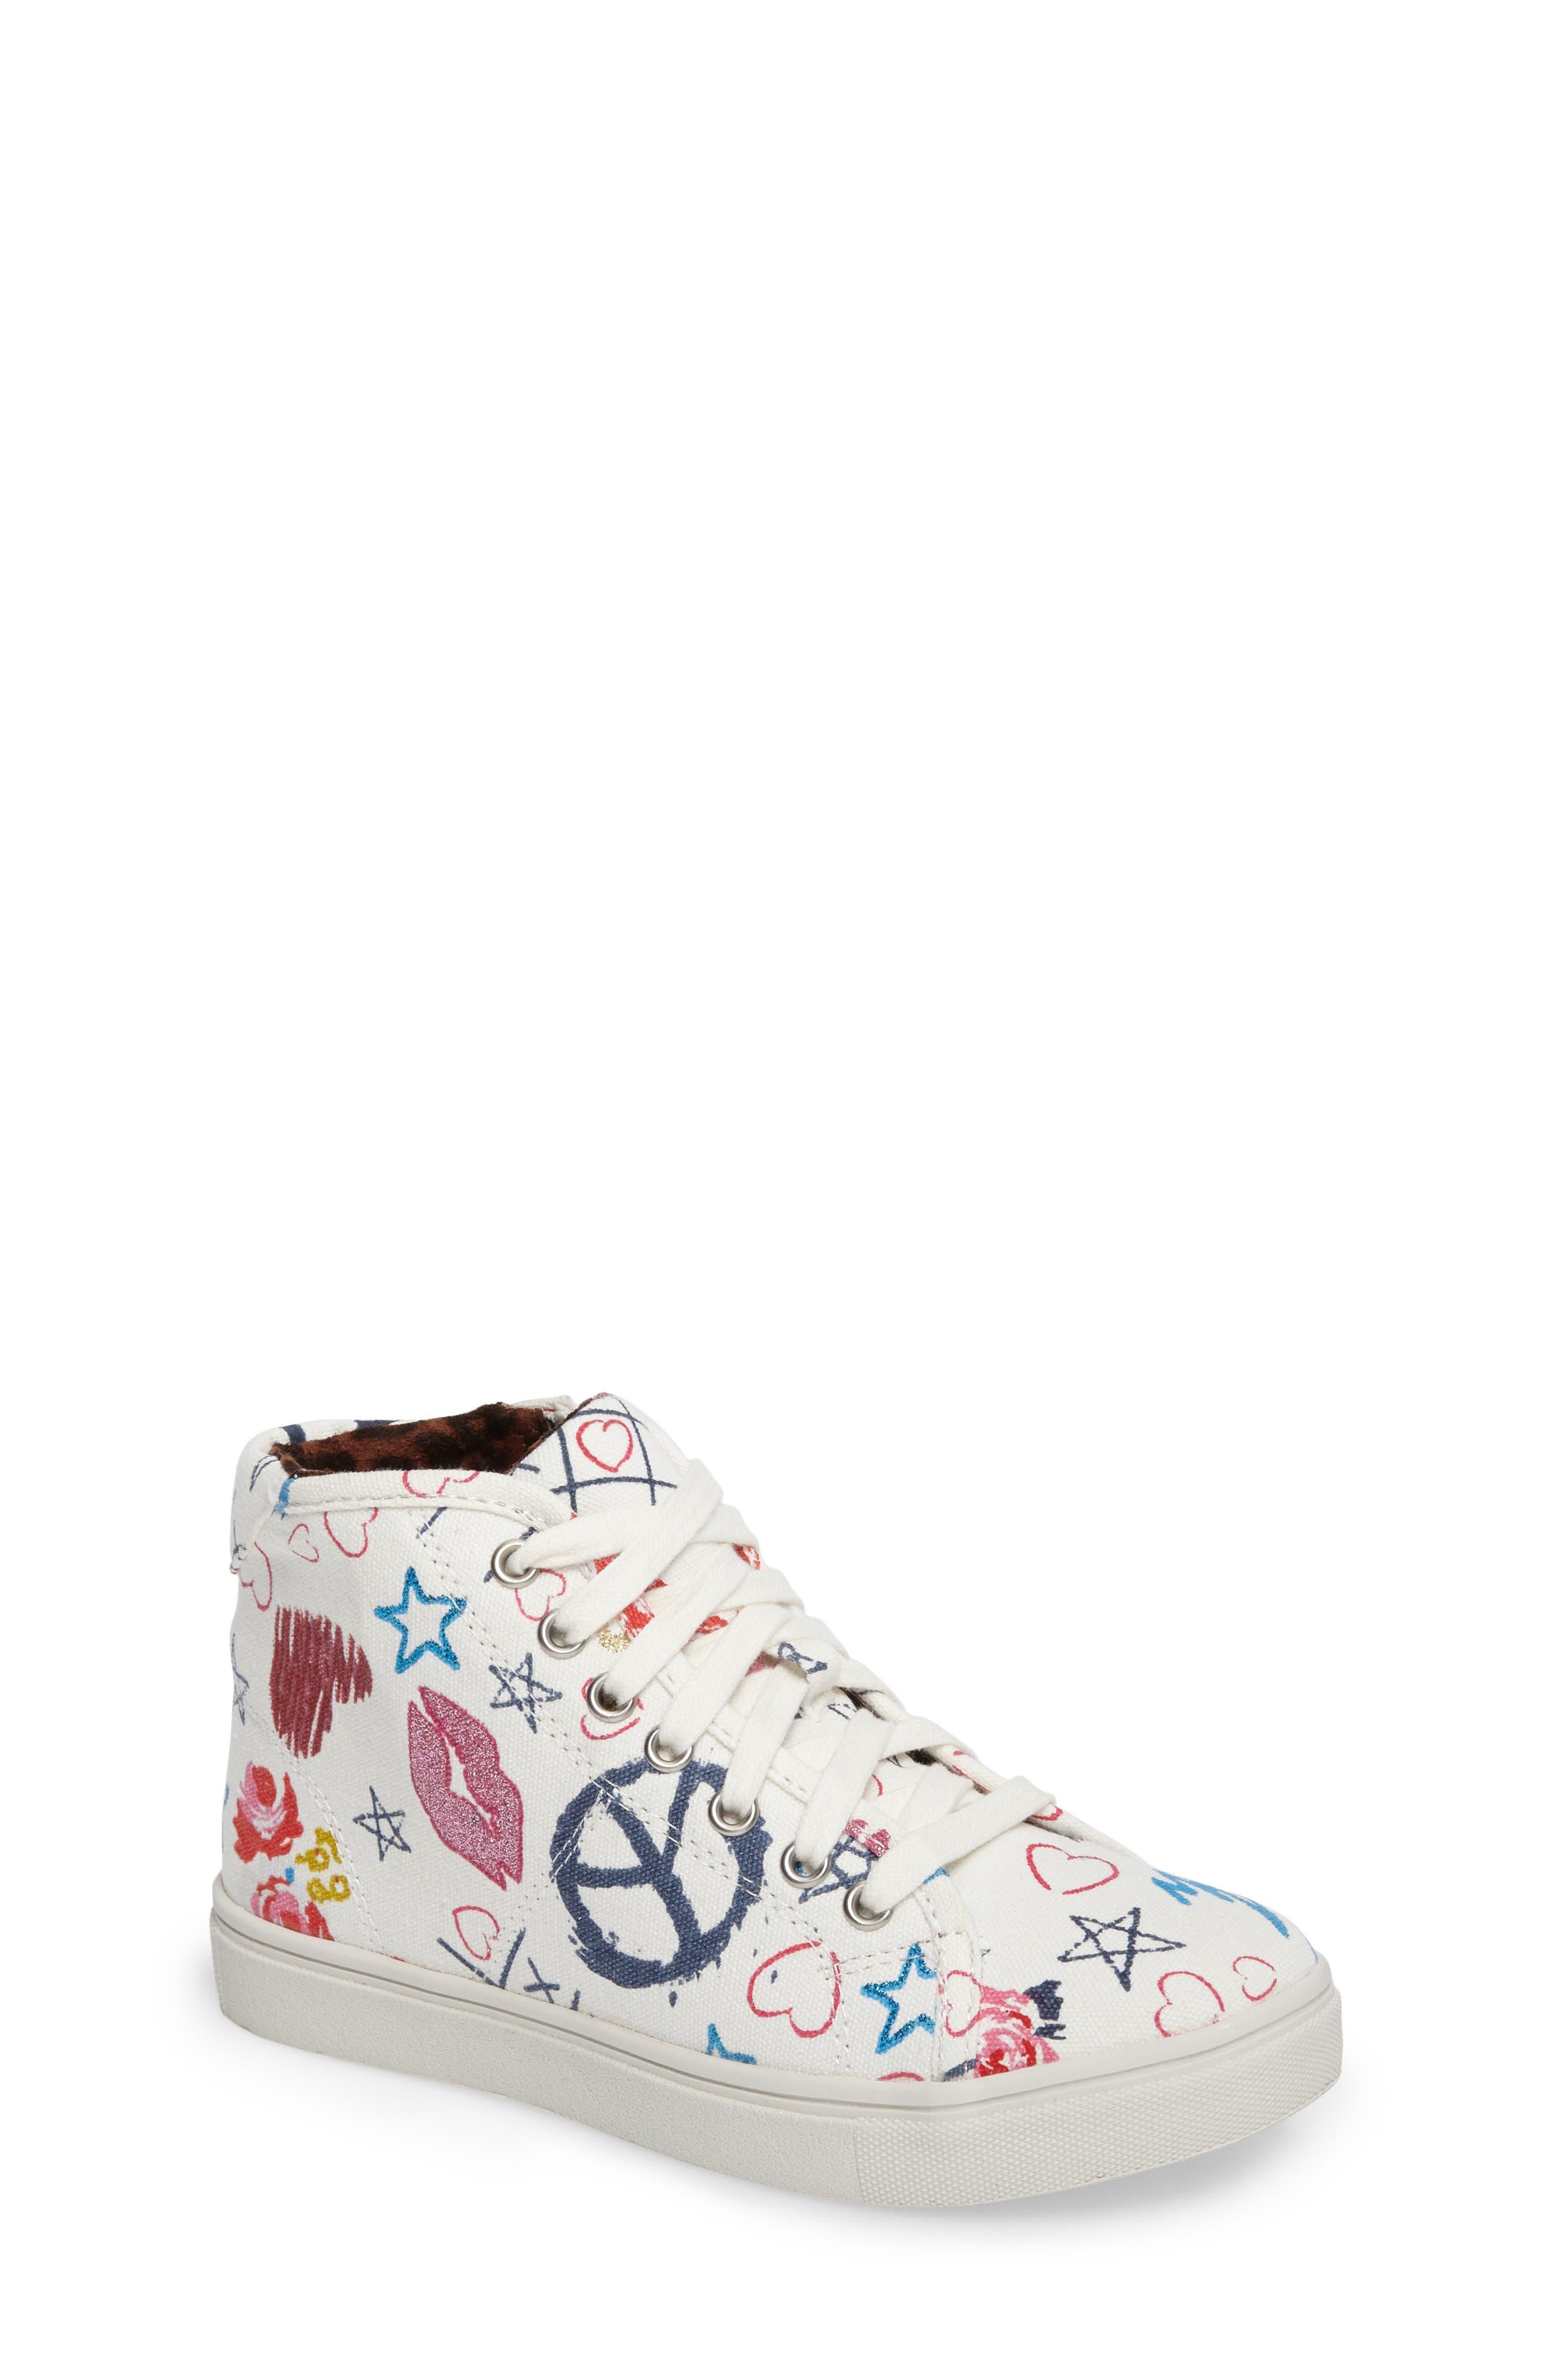 JScribble High Top Sneaker,                         Main,                         color, White